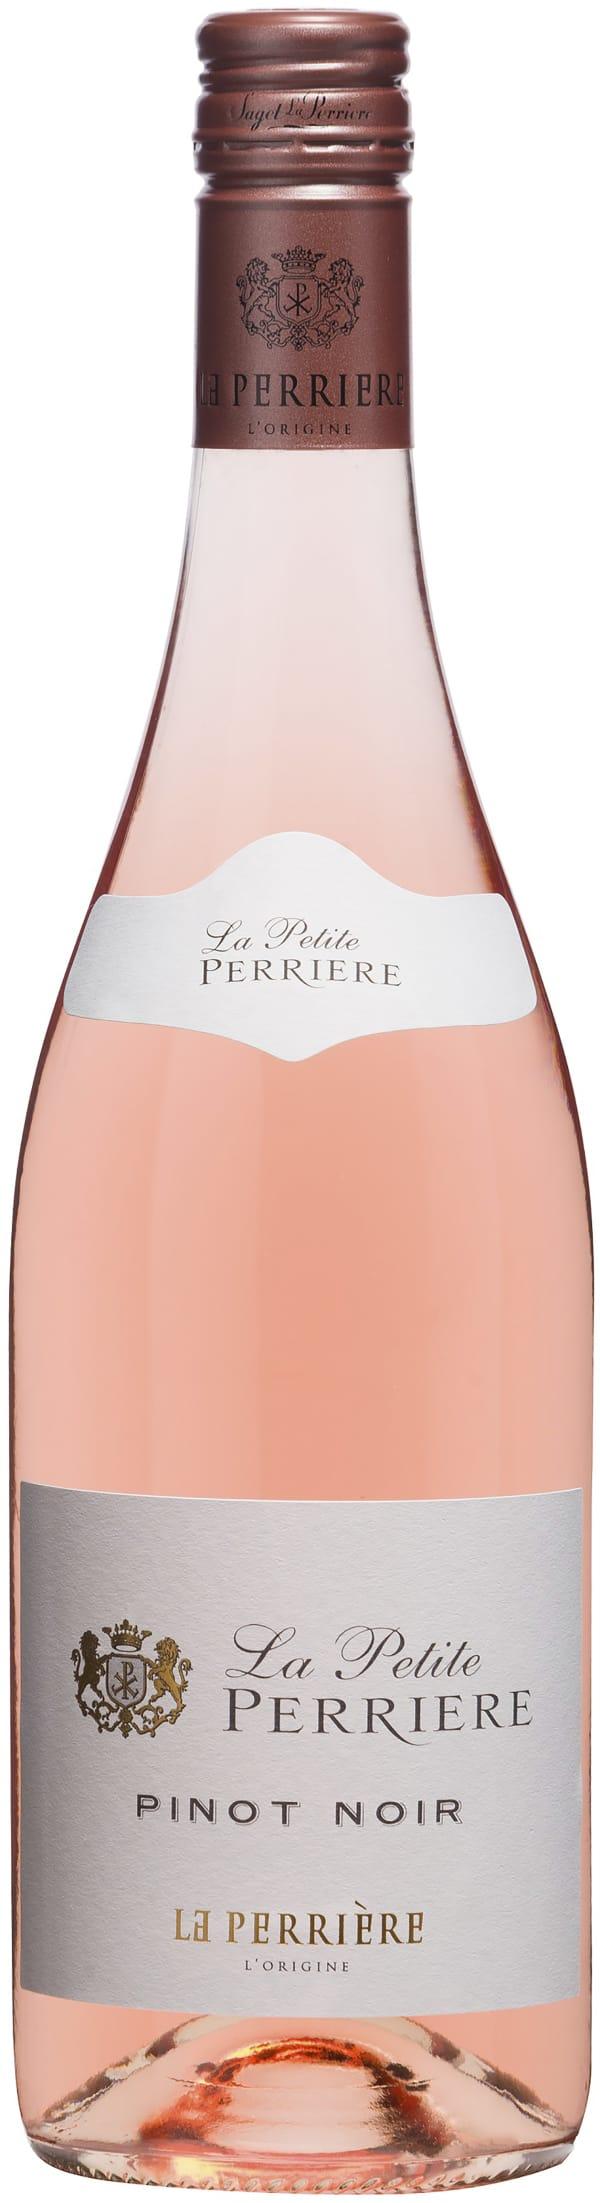 La Petite Perriere Rose Pinot Noir 2018